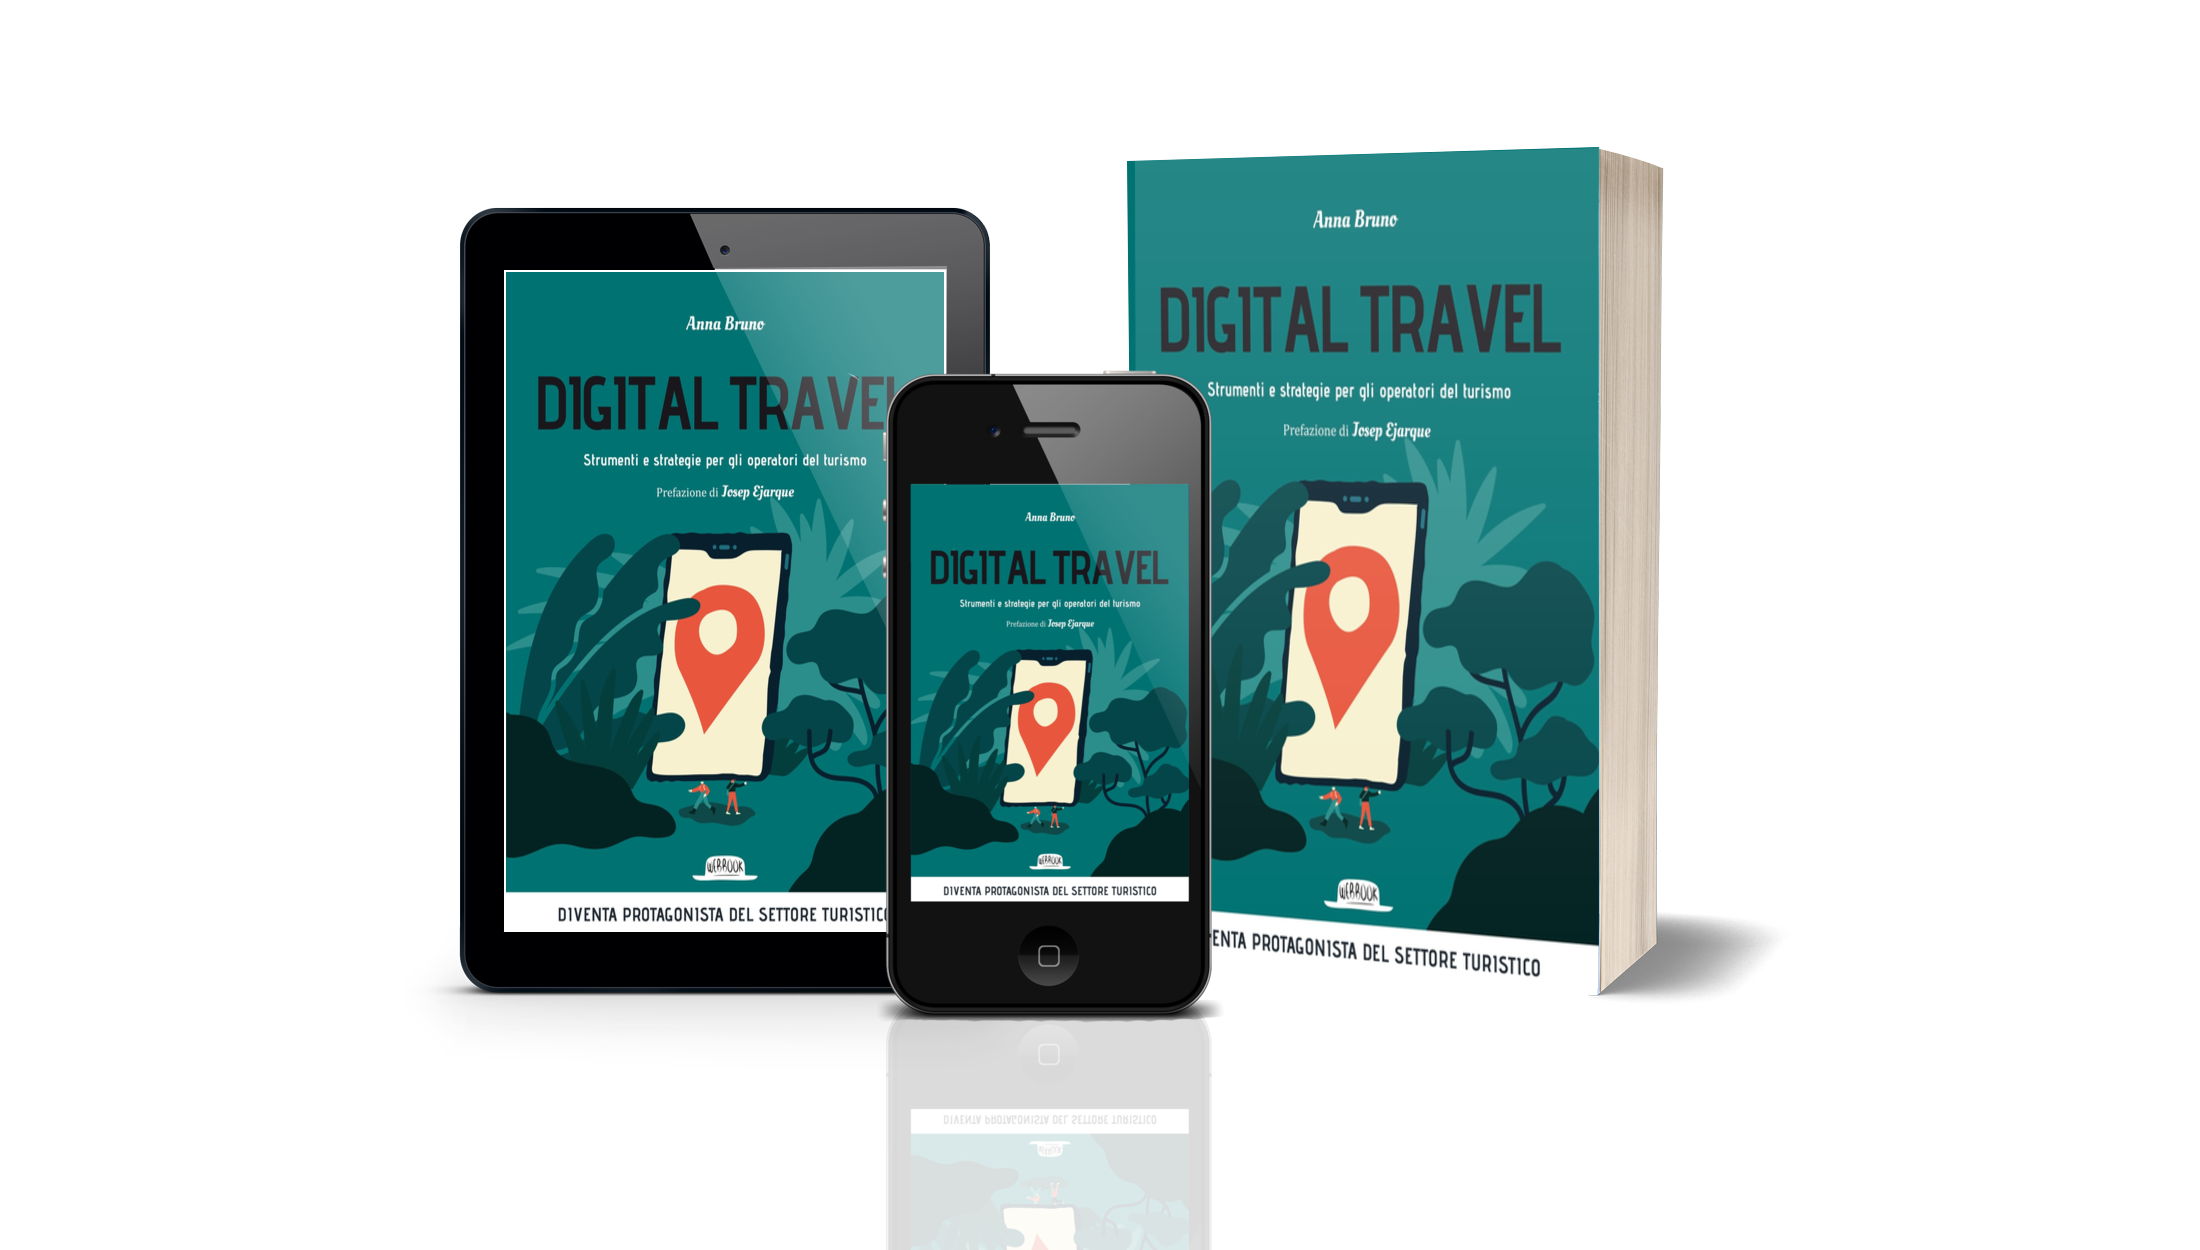 Digital Travel, Anna Bruno